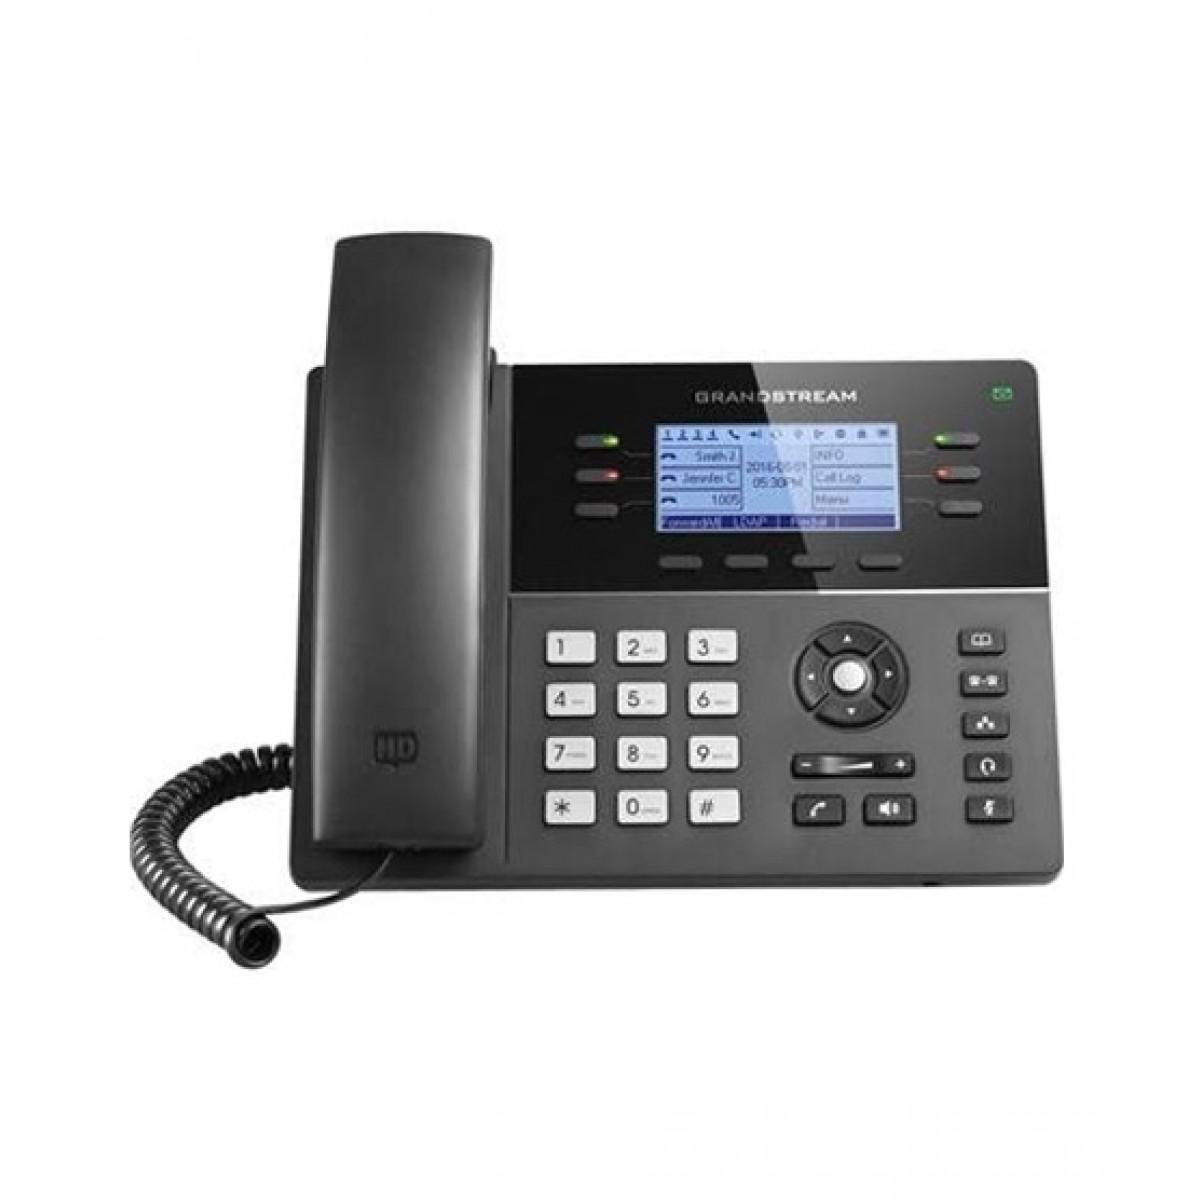 Grandstream VoIP Landline Telephone (GXP1760W)